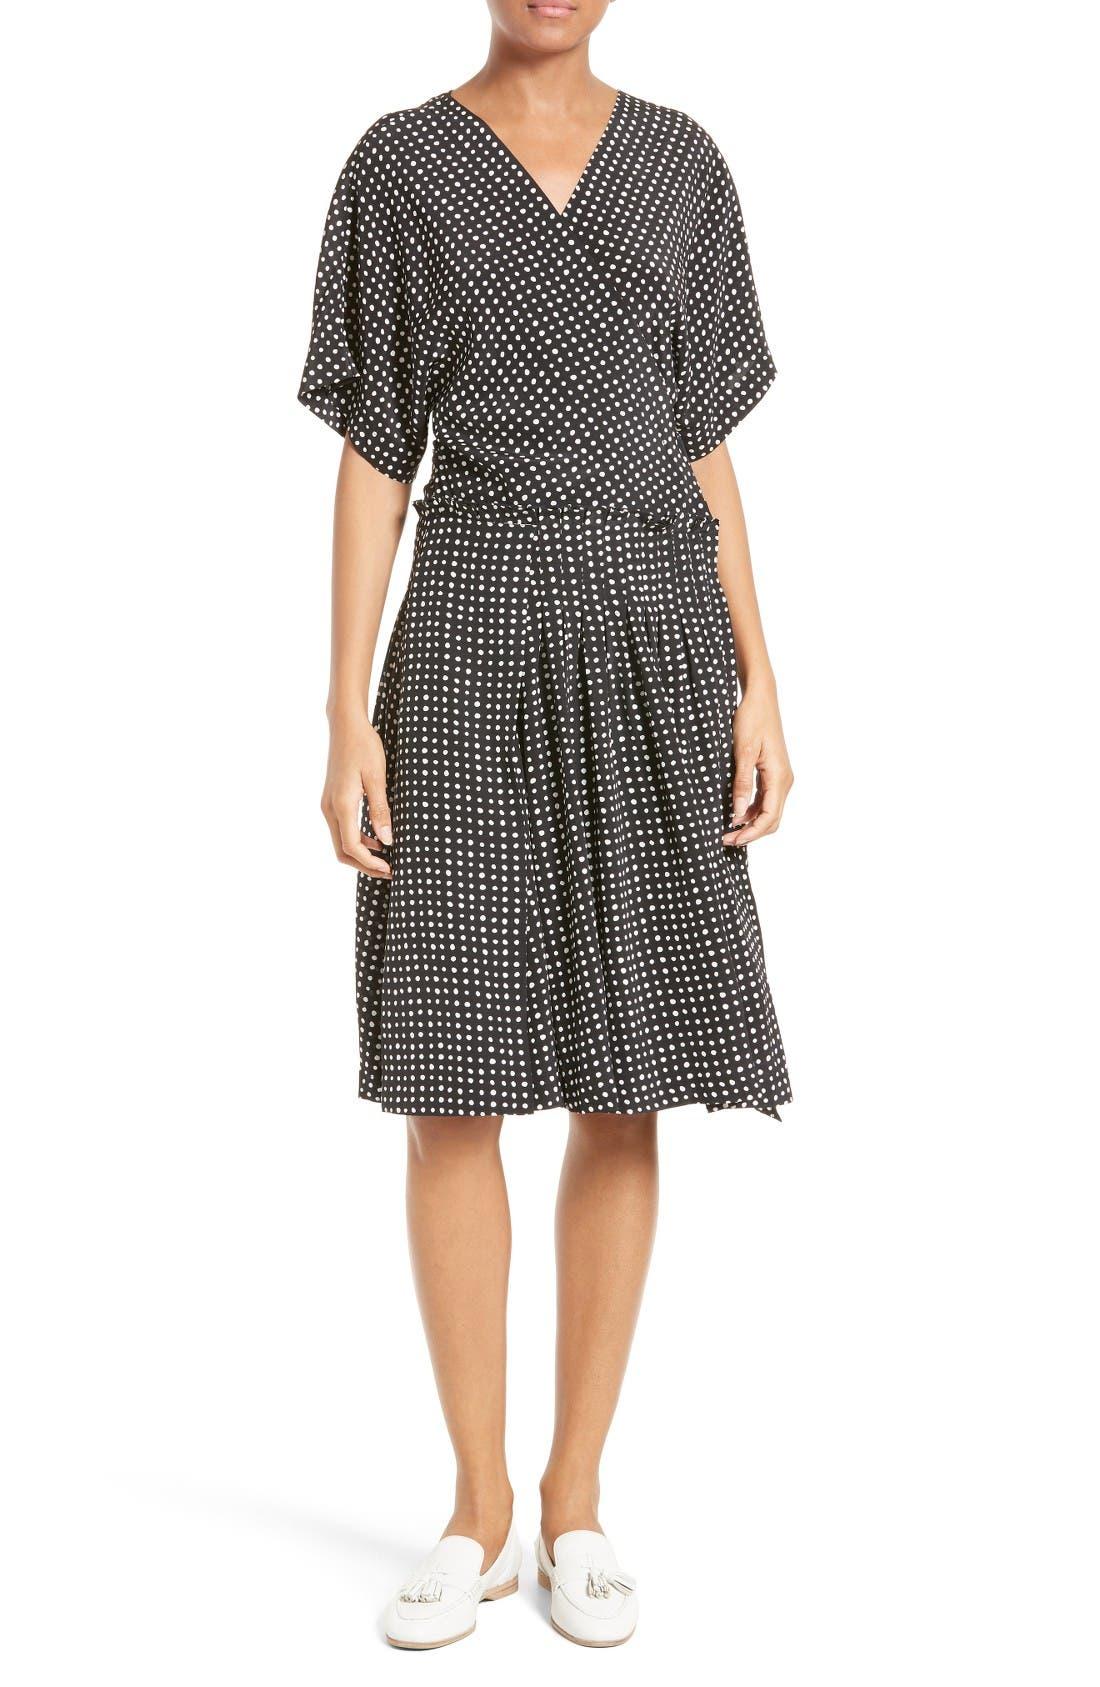 Main Image - Diane von Furstenberg Polka Dot Silk D-Ring Wrap Dress